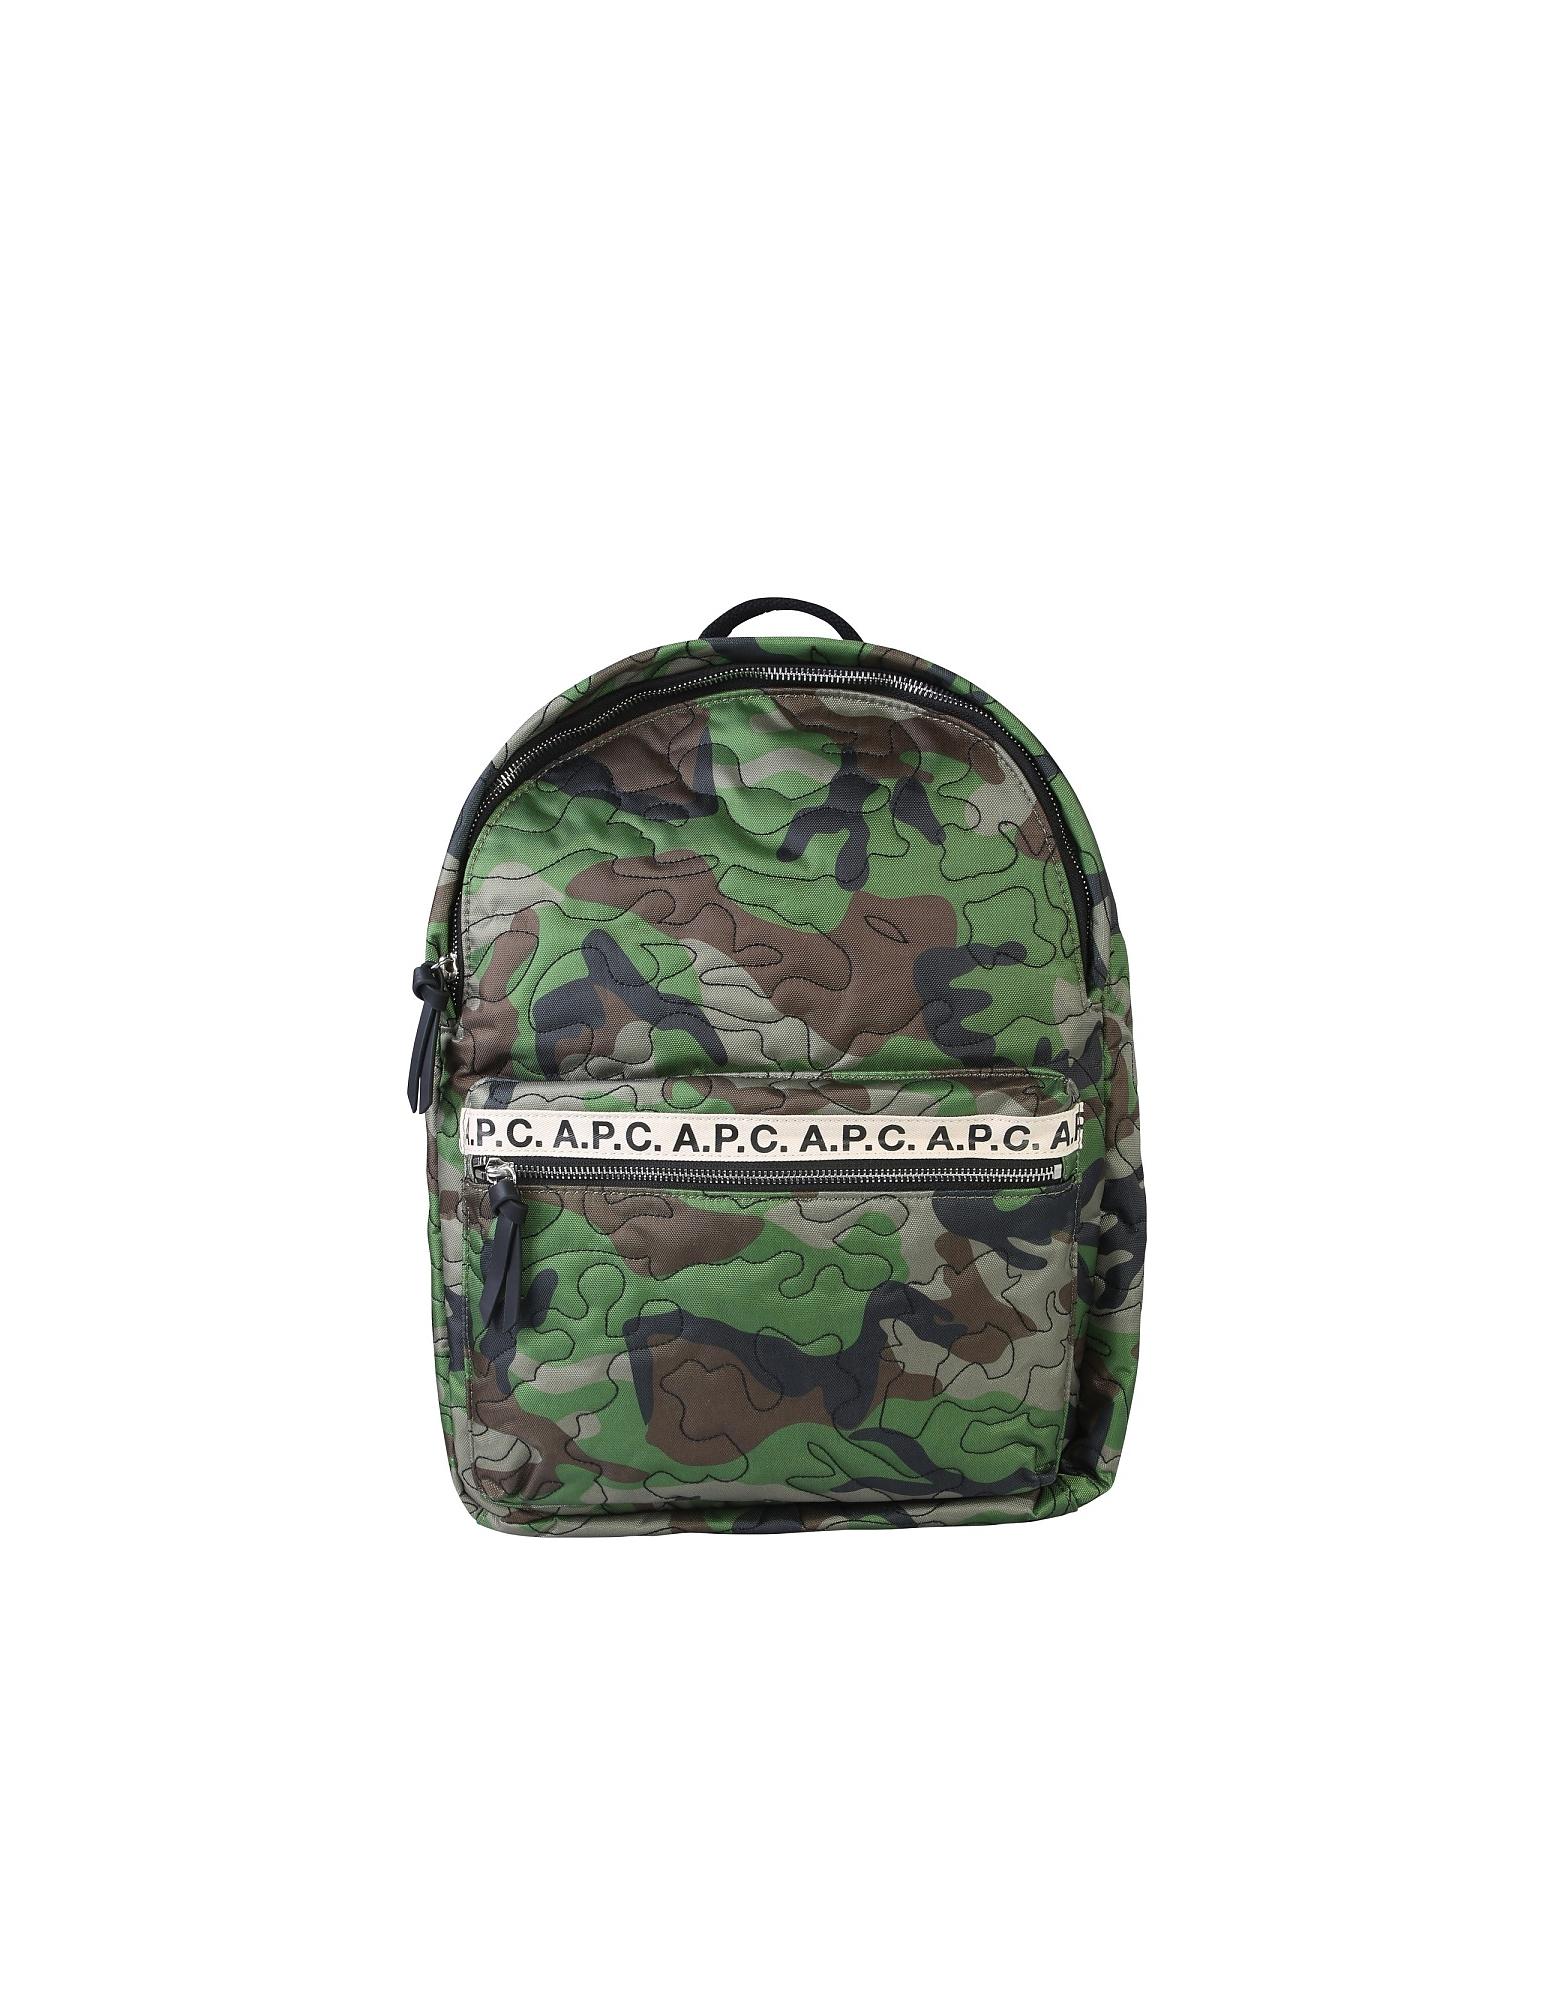 A.P.C. Designer Men's Bags, Backpack With Logo